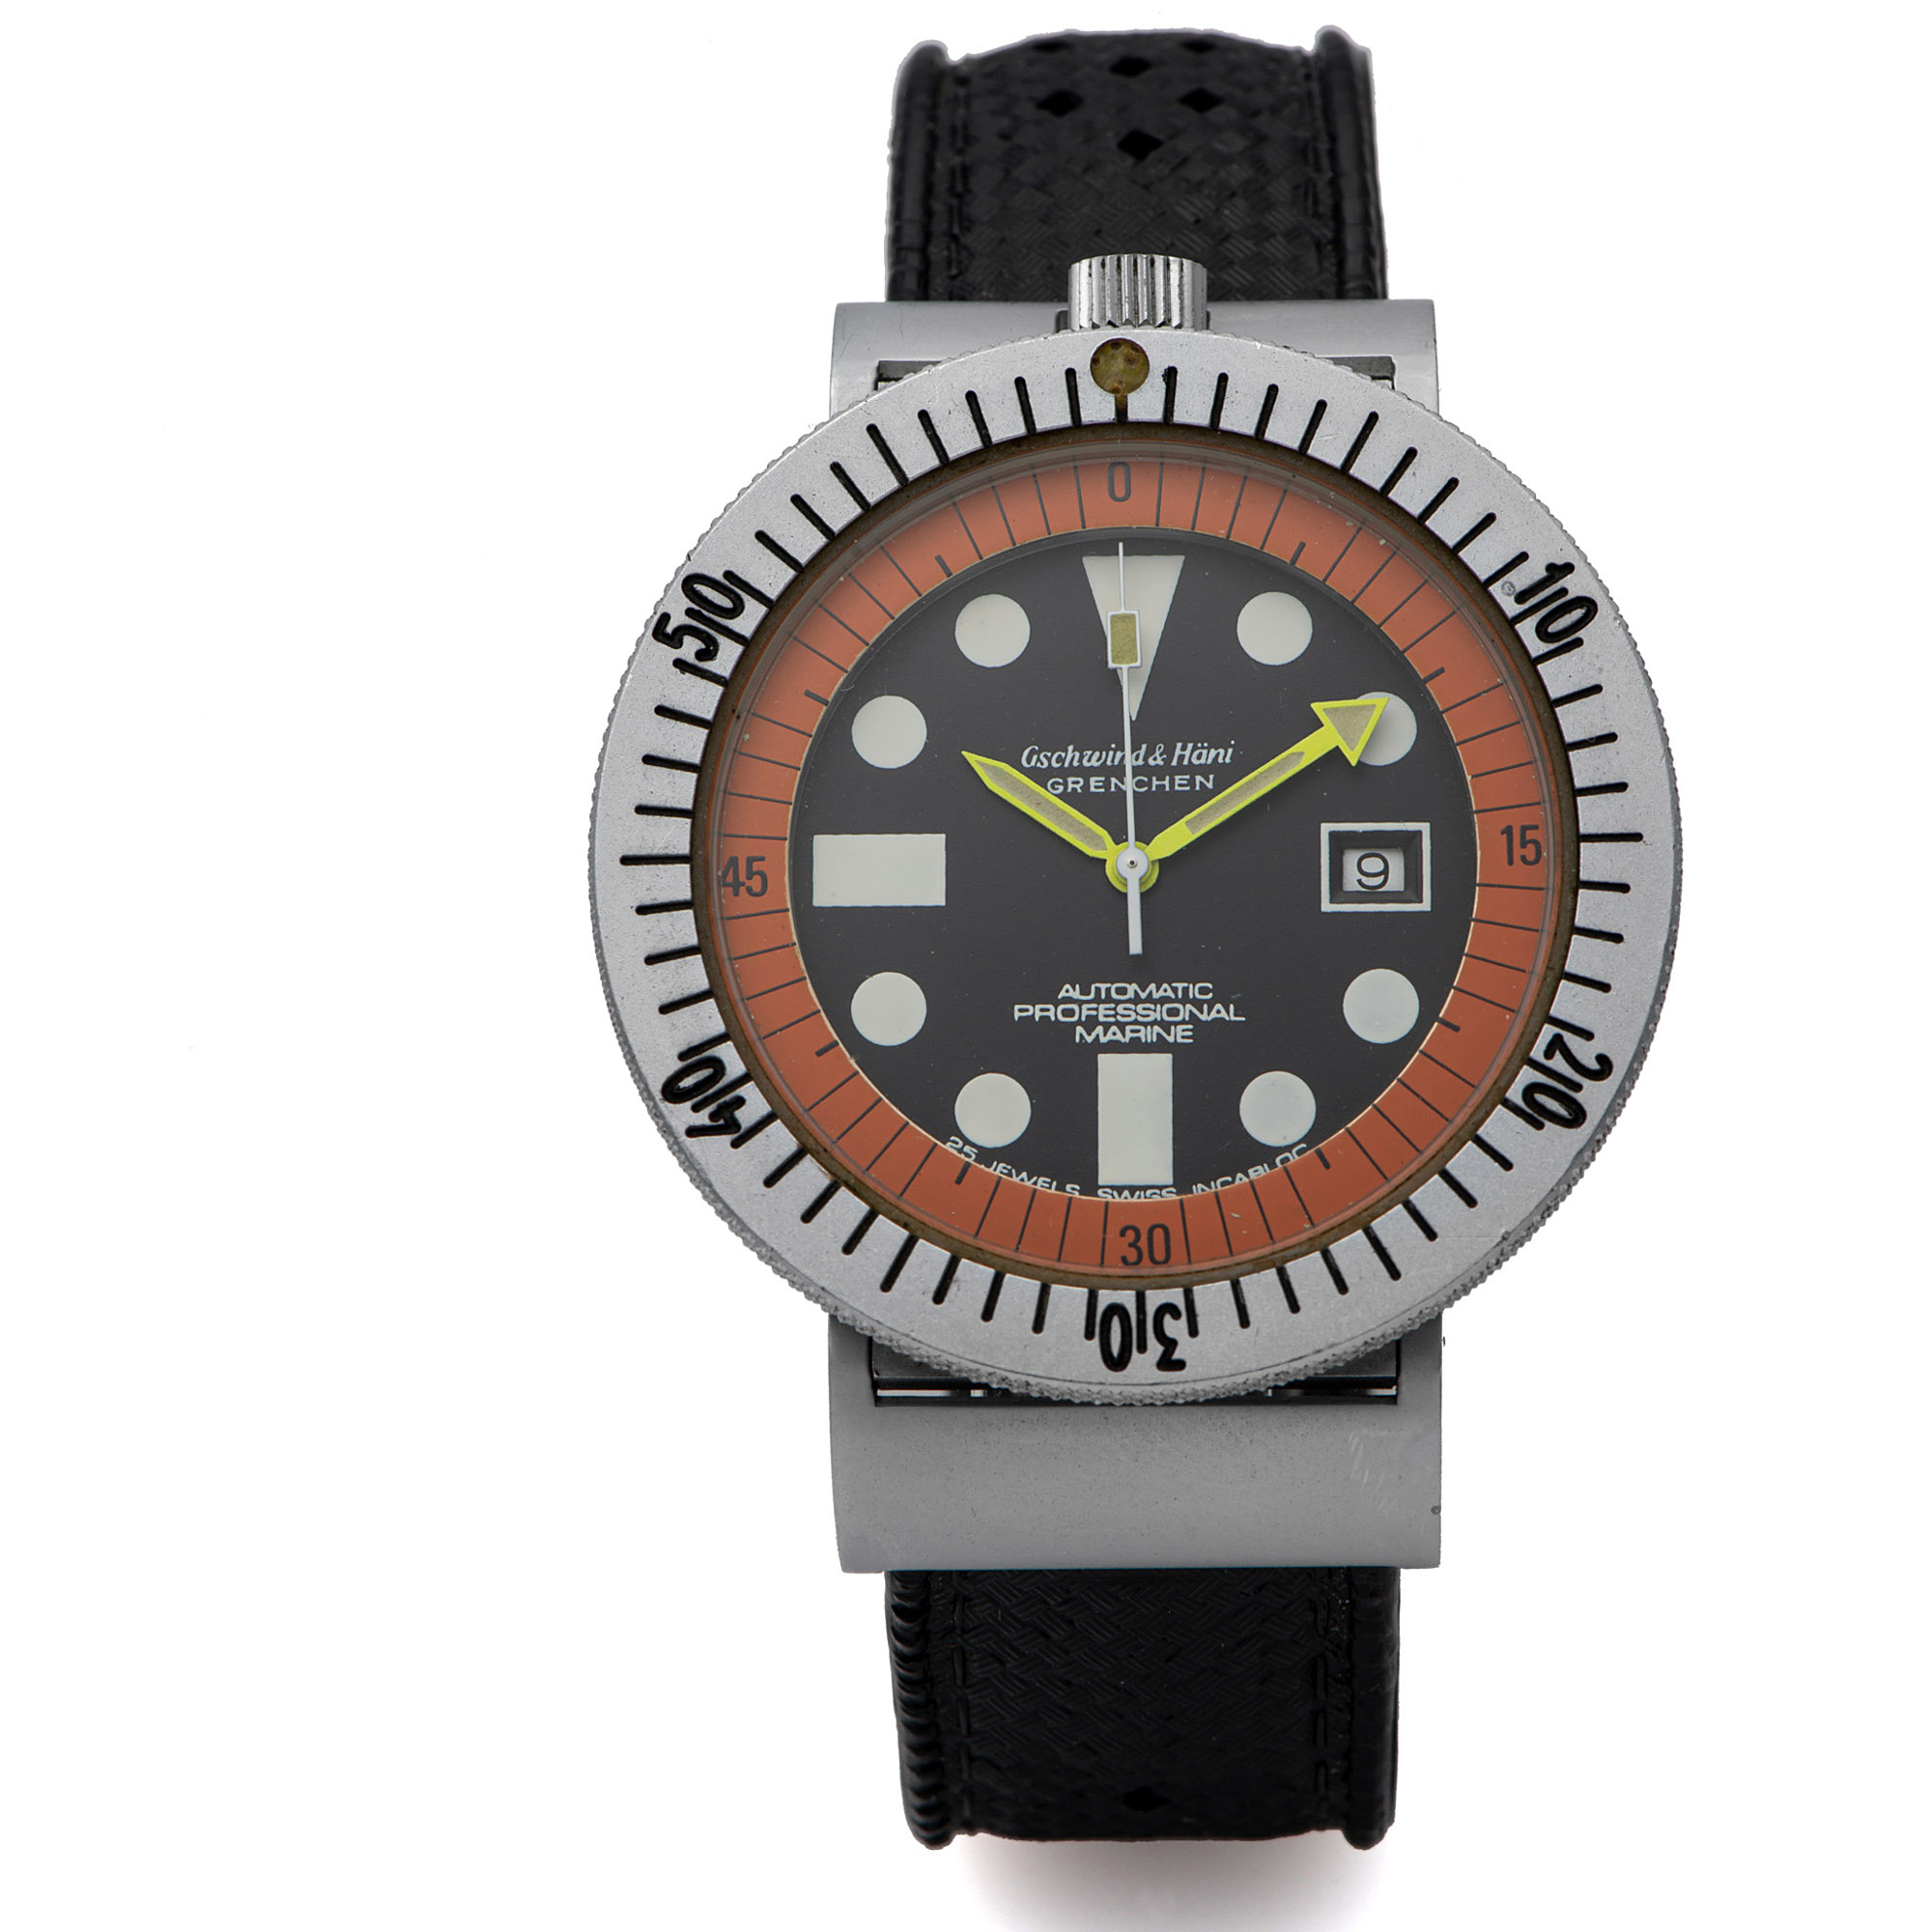 Gschwind & Häni Prototype Diver's Watch